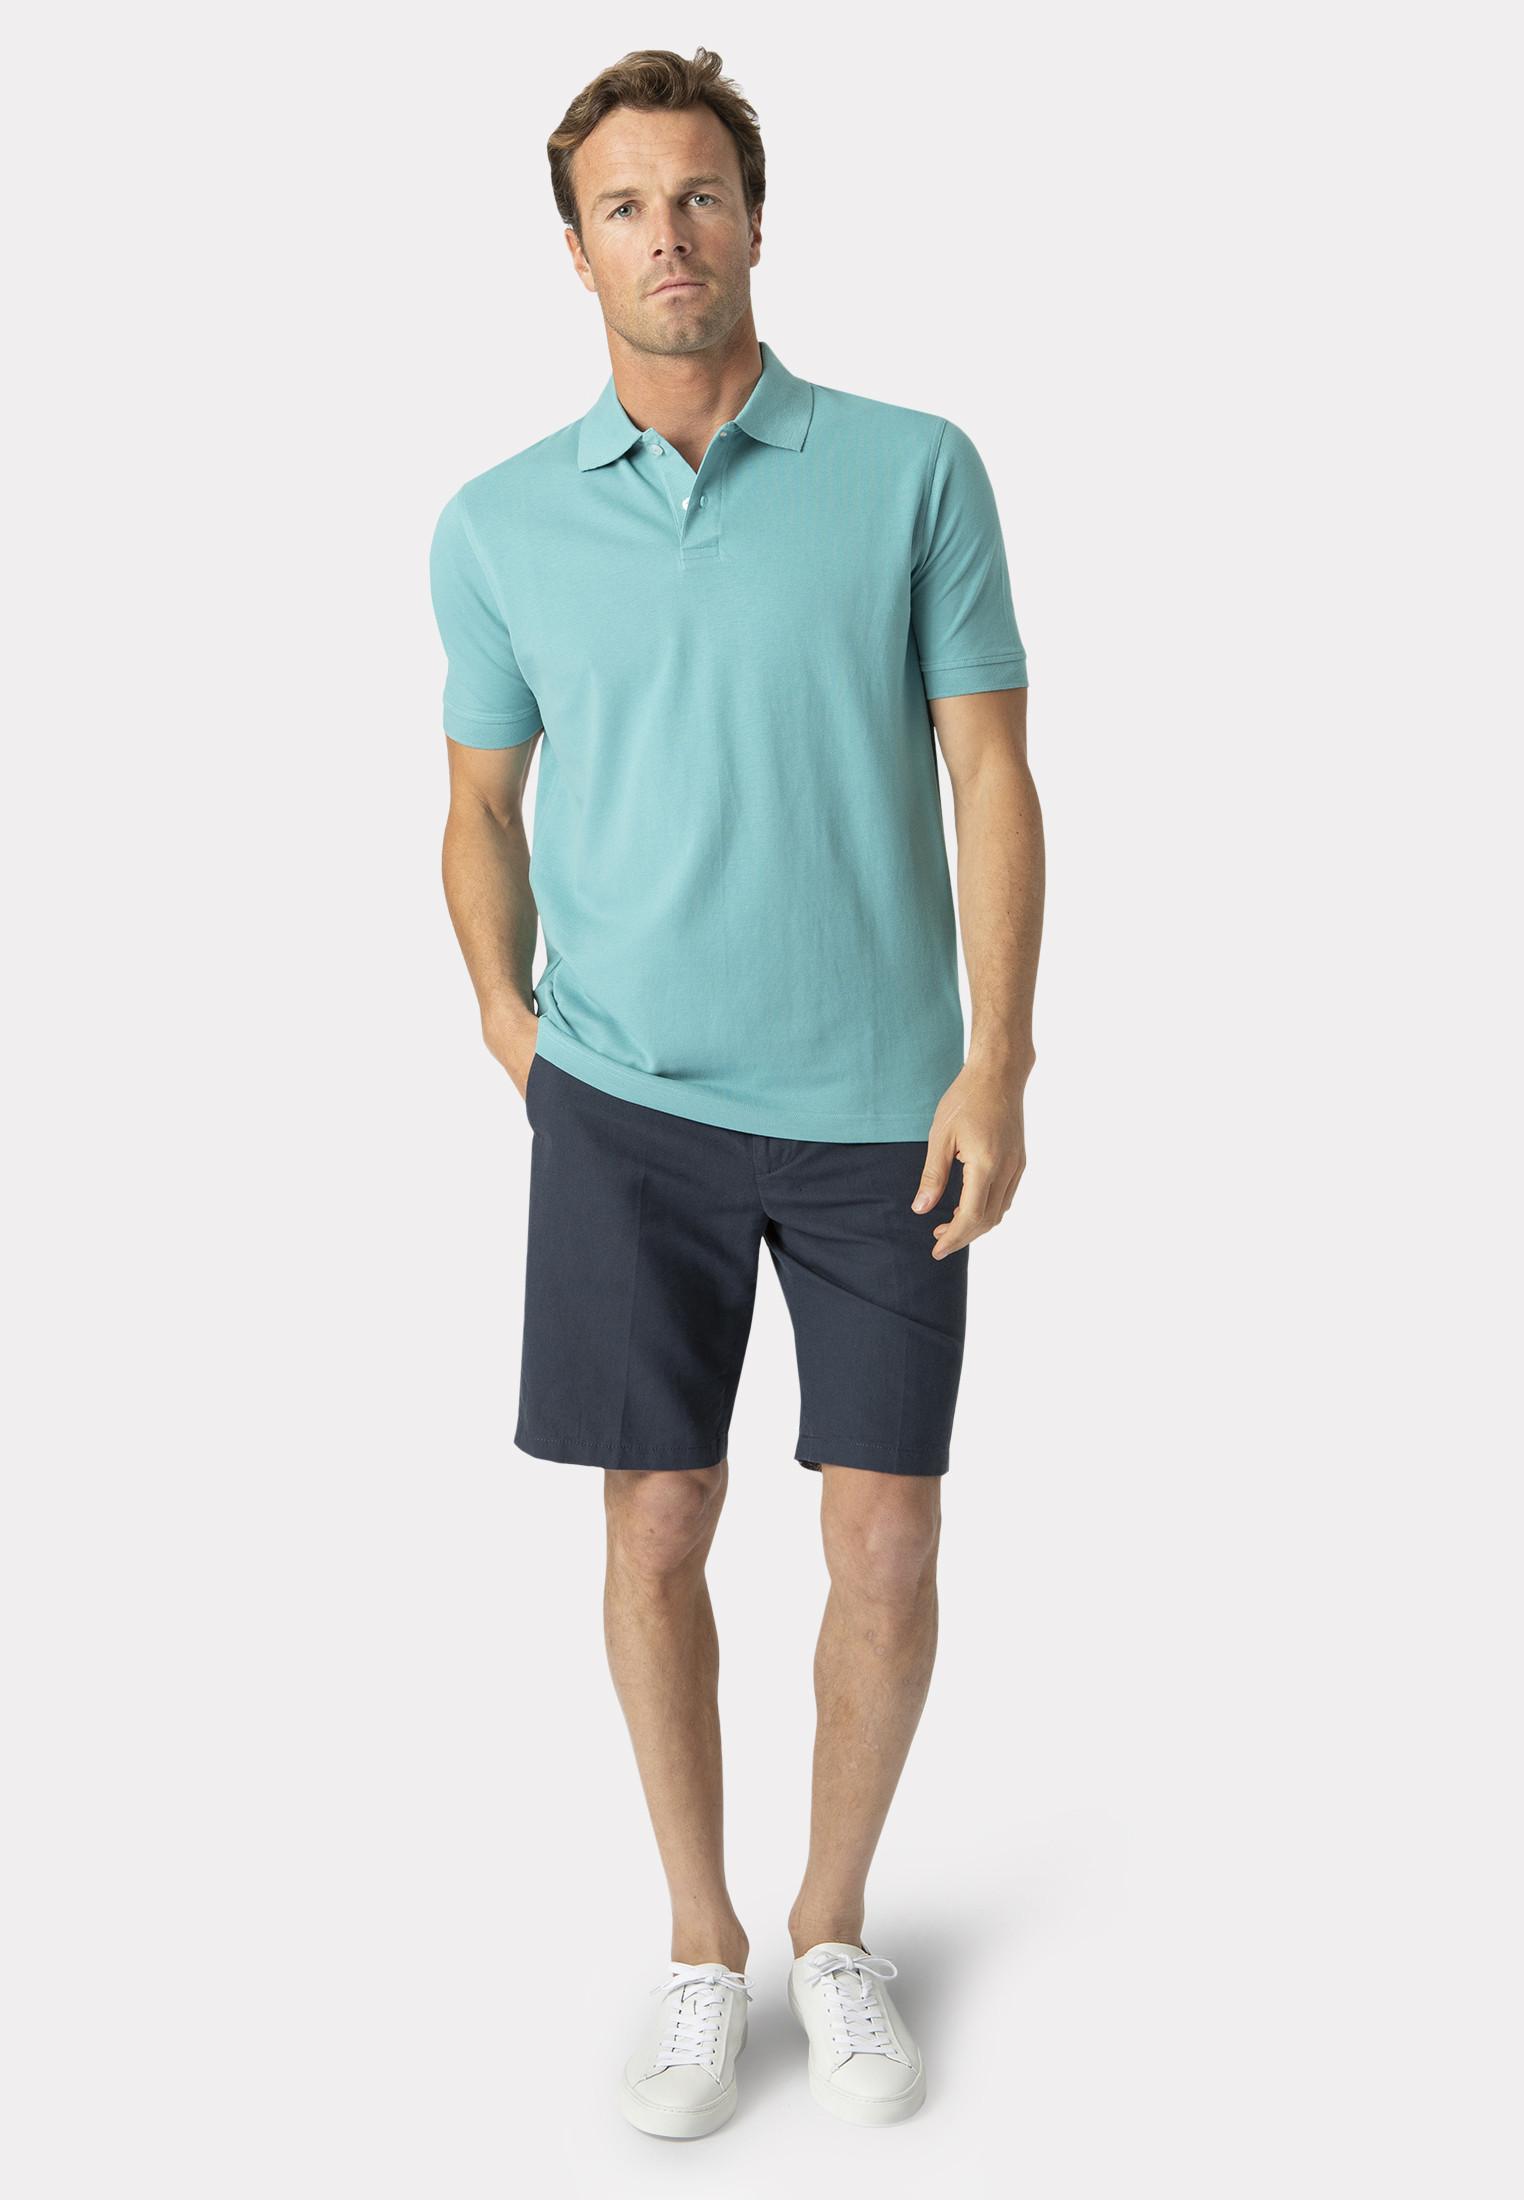 Milford Opal 100% Pique Cotton Polo Shirt